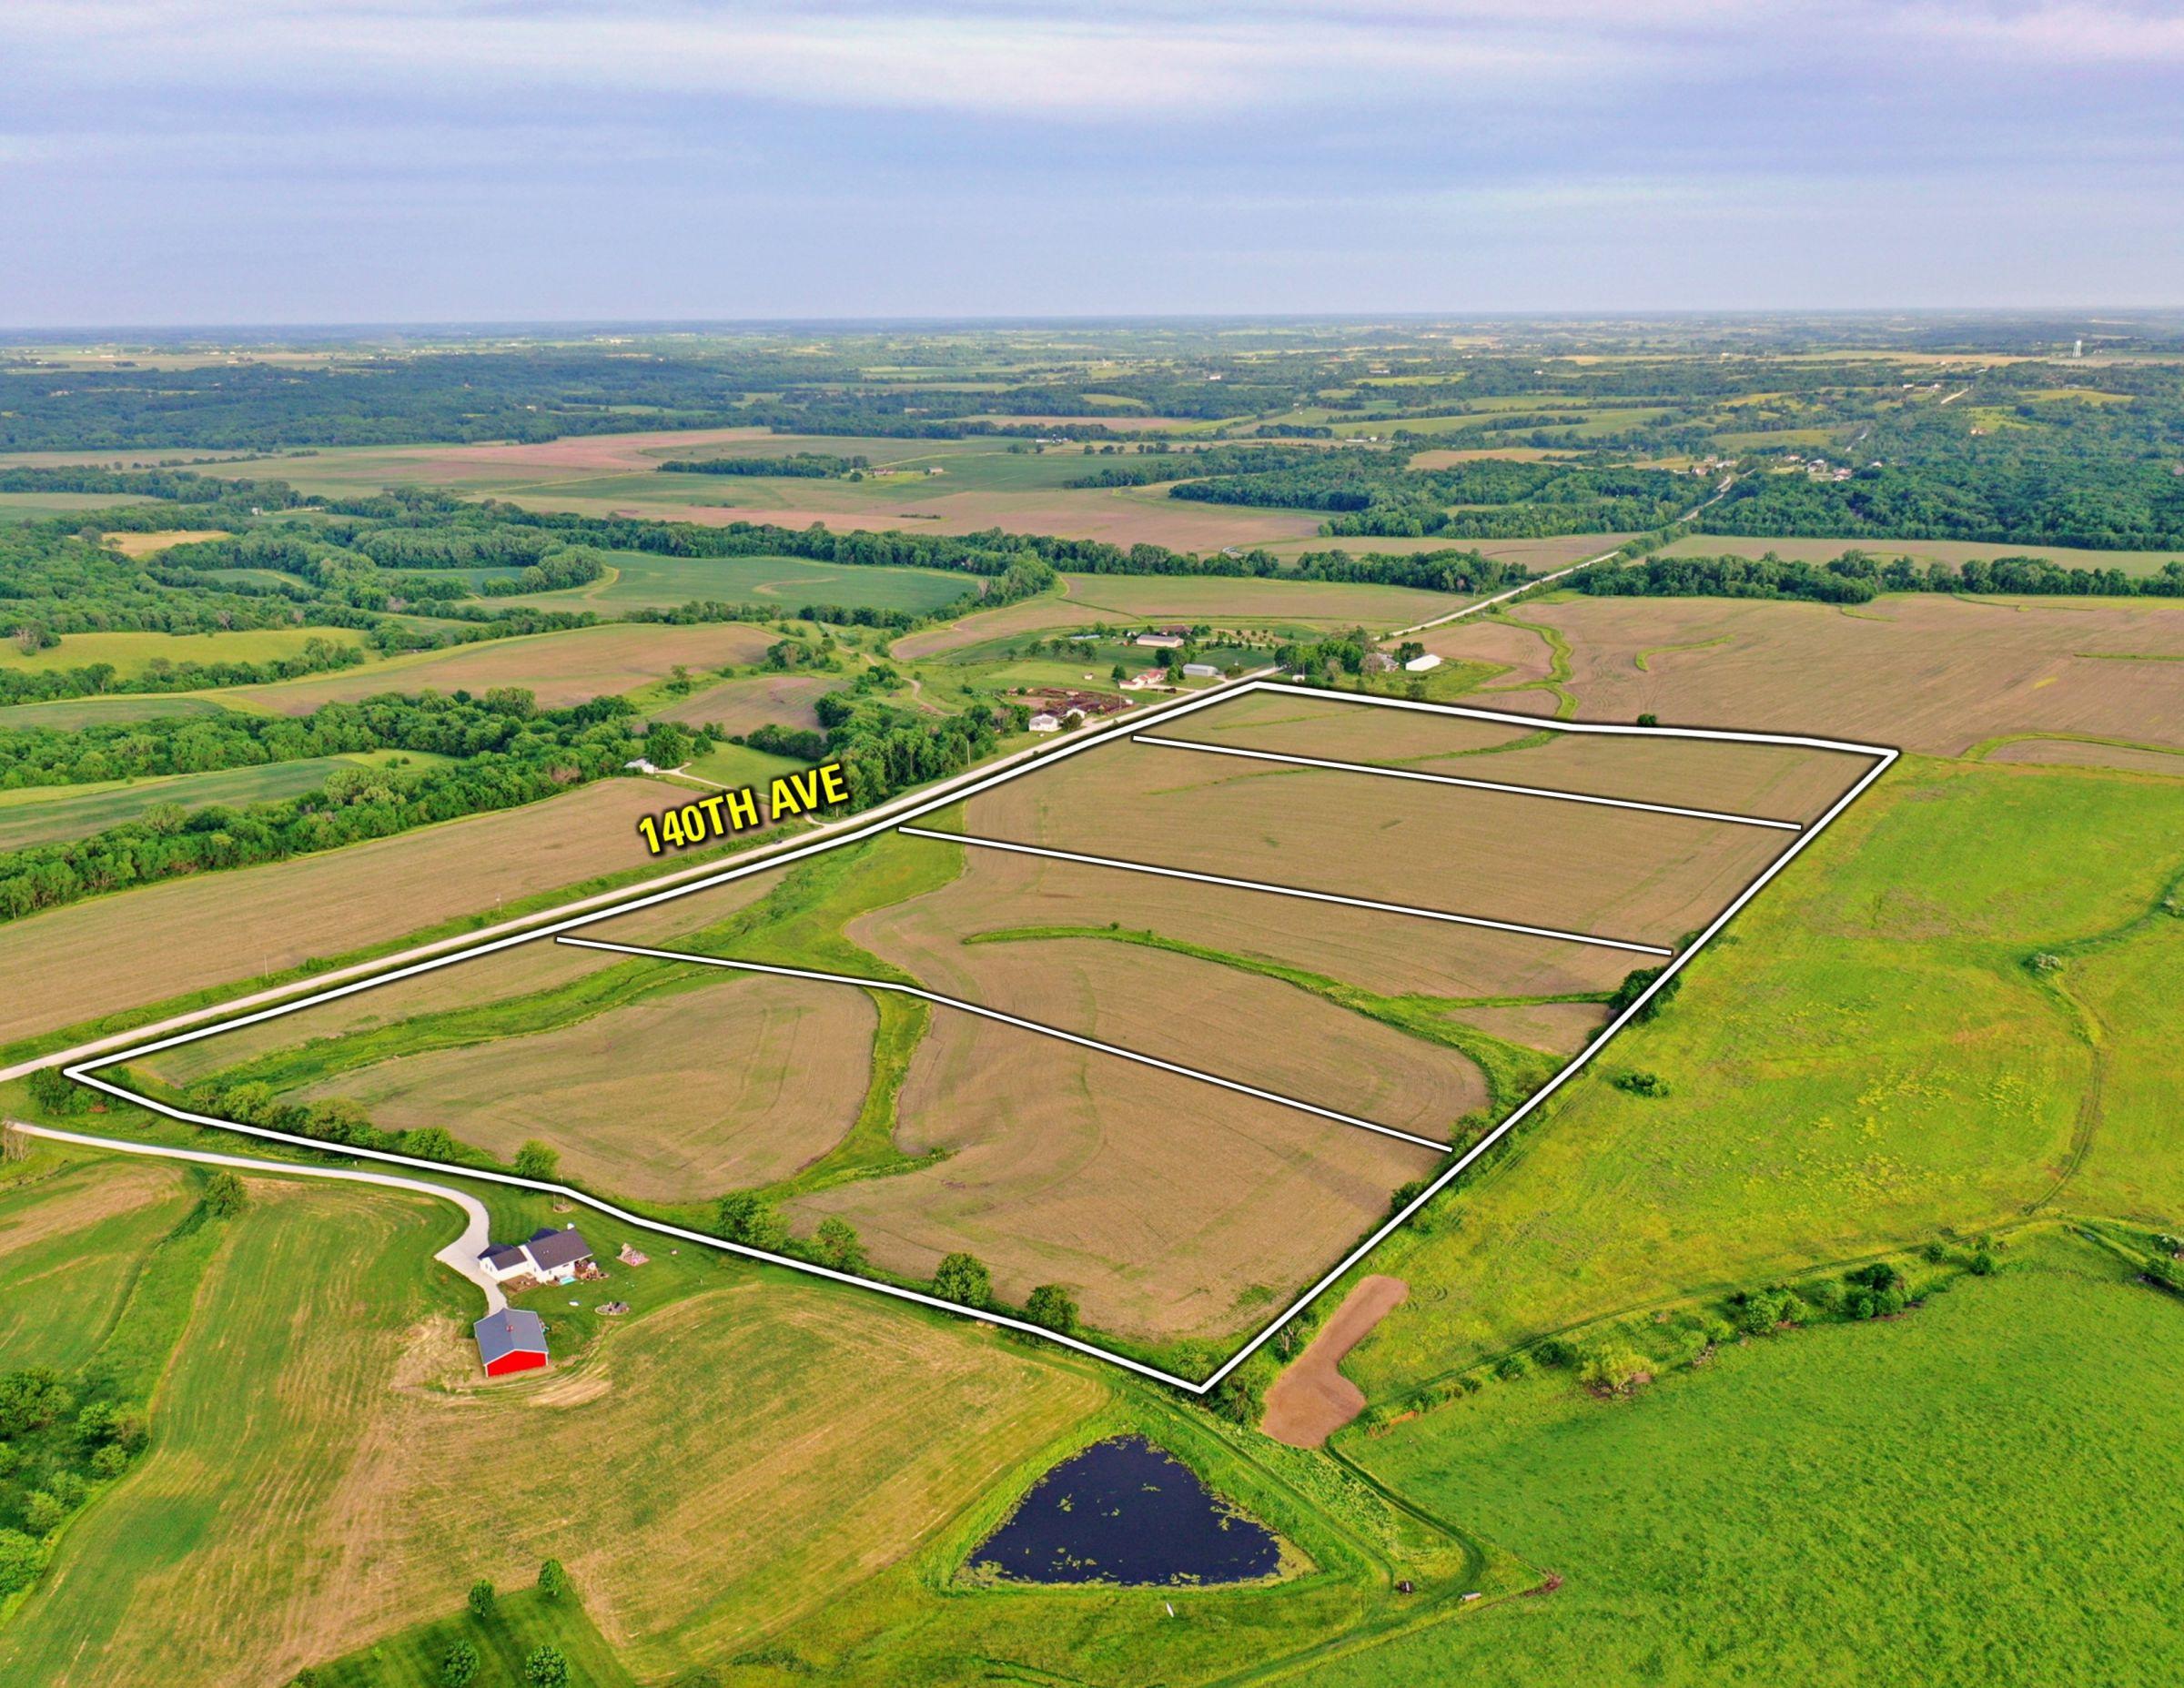 development-land-warren-county-iowa-20-acres-listing-number-15424-1-2021-03-26-185018.jpg